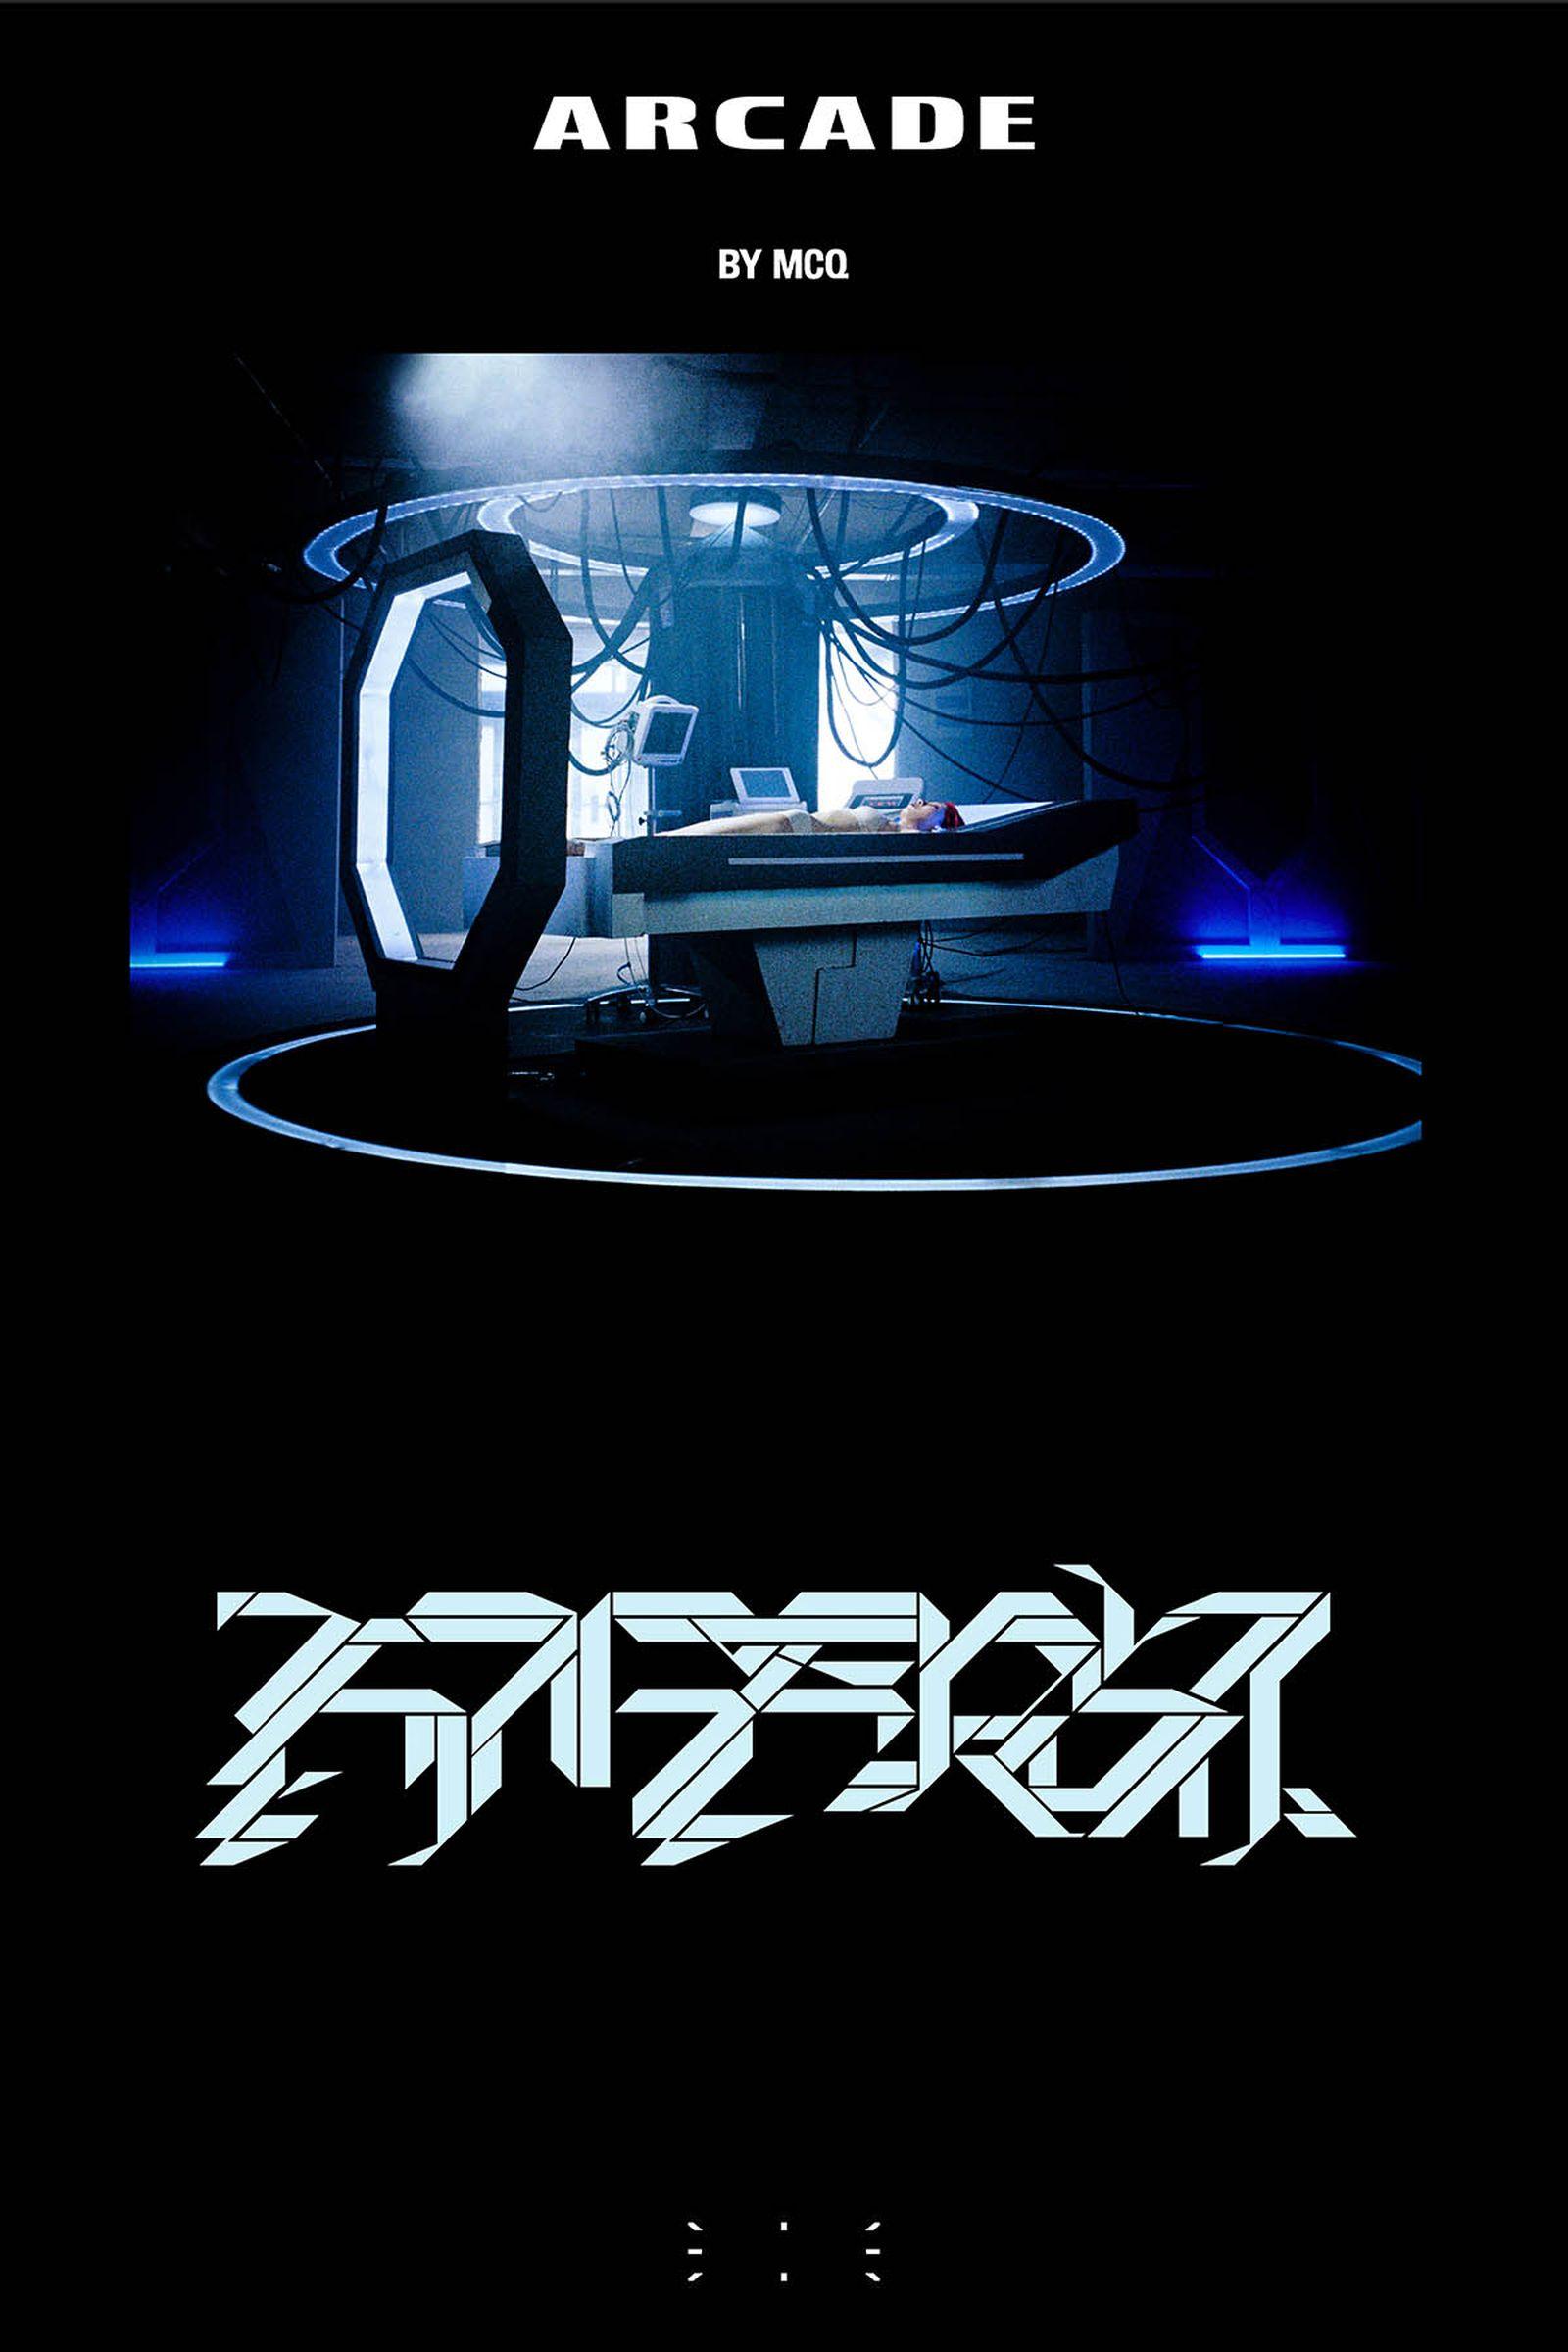 mcq-arcade-01